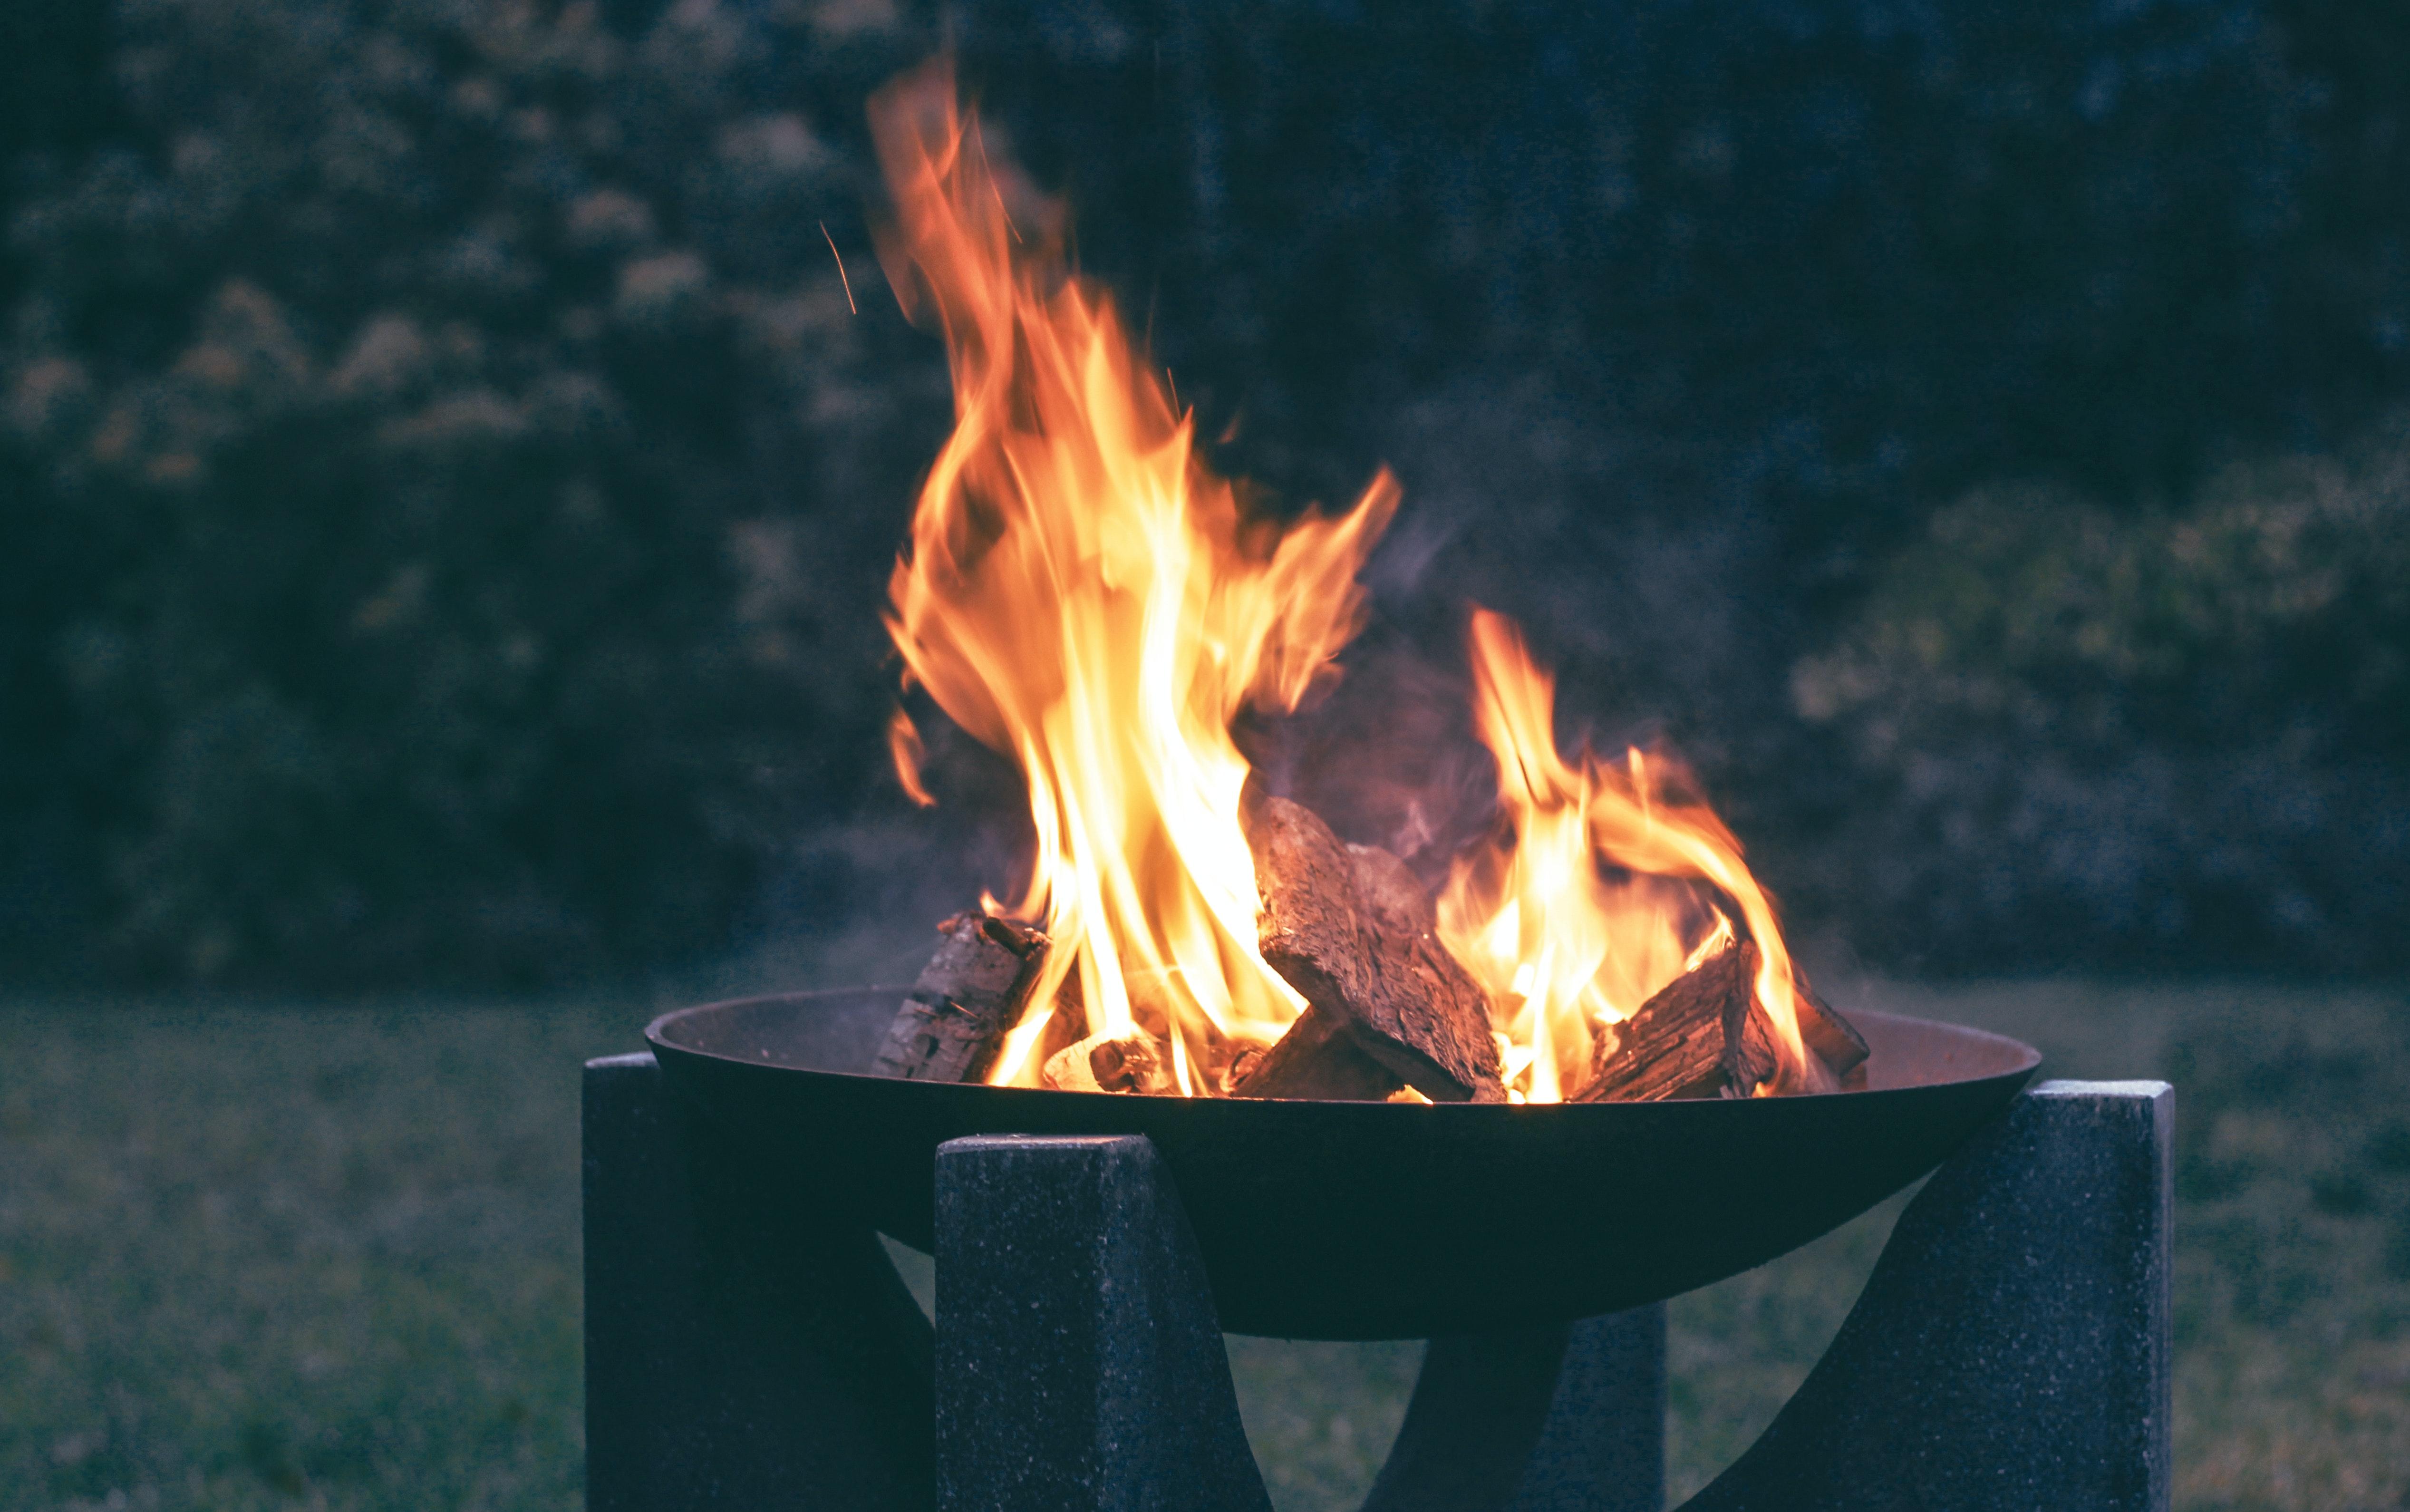 100 Amazing Campfire Photos 183 Pexels 183 Free Stock Photos